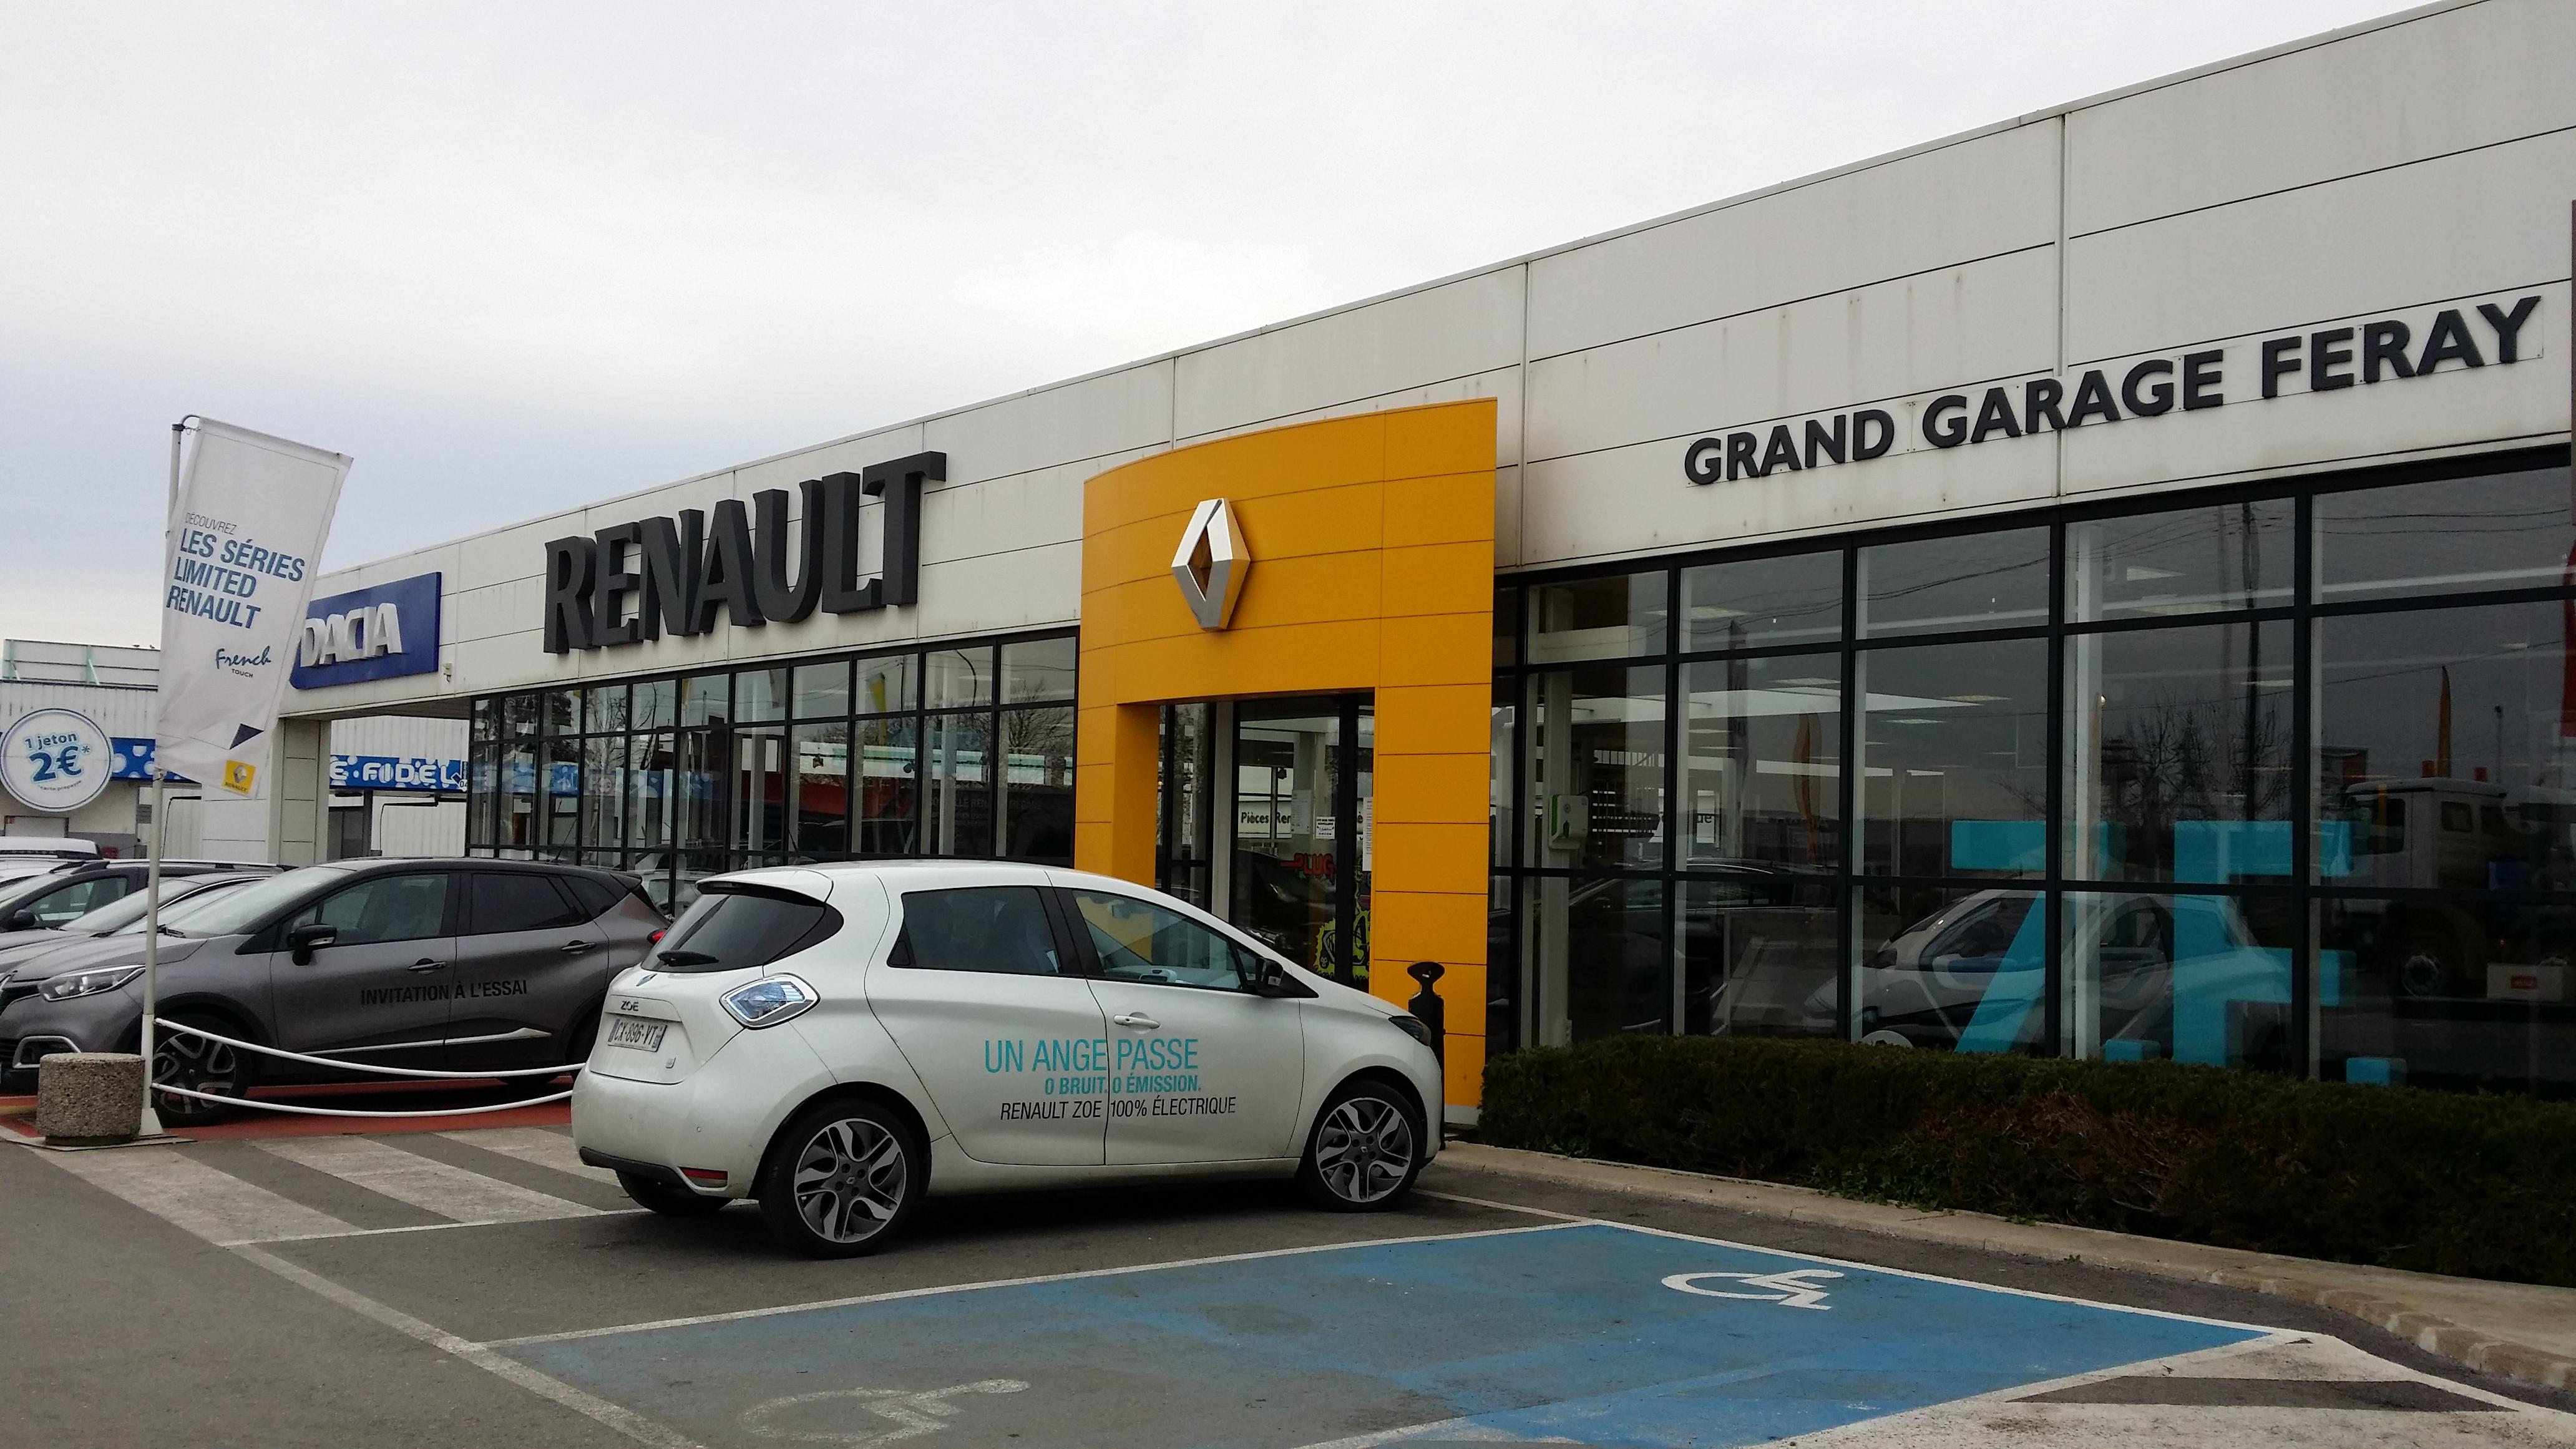 Grand Garage Feray Renault Corbeil